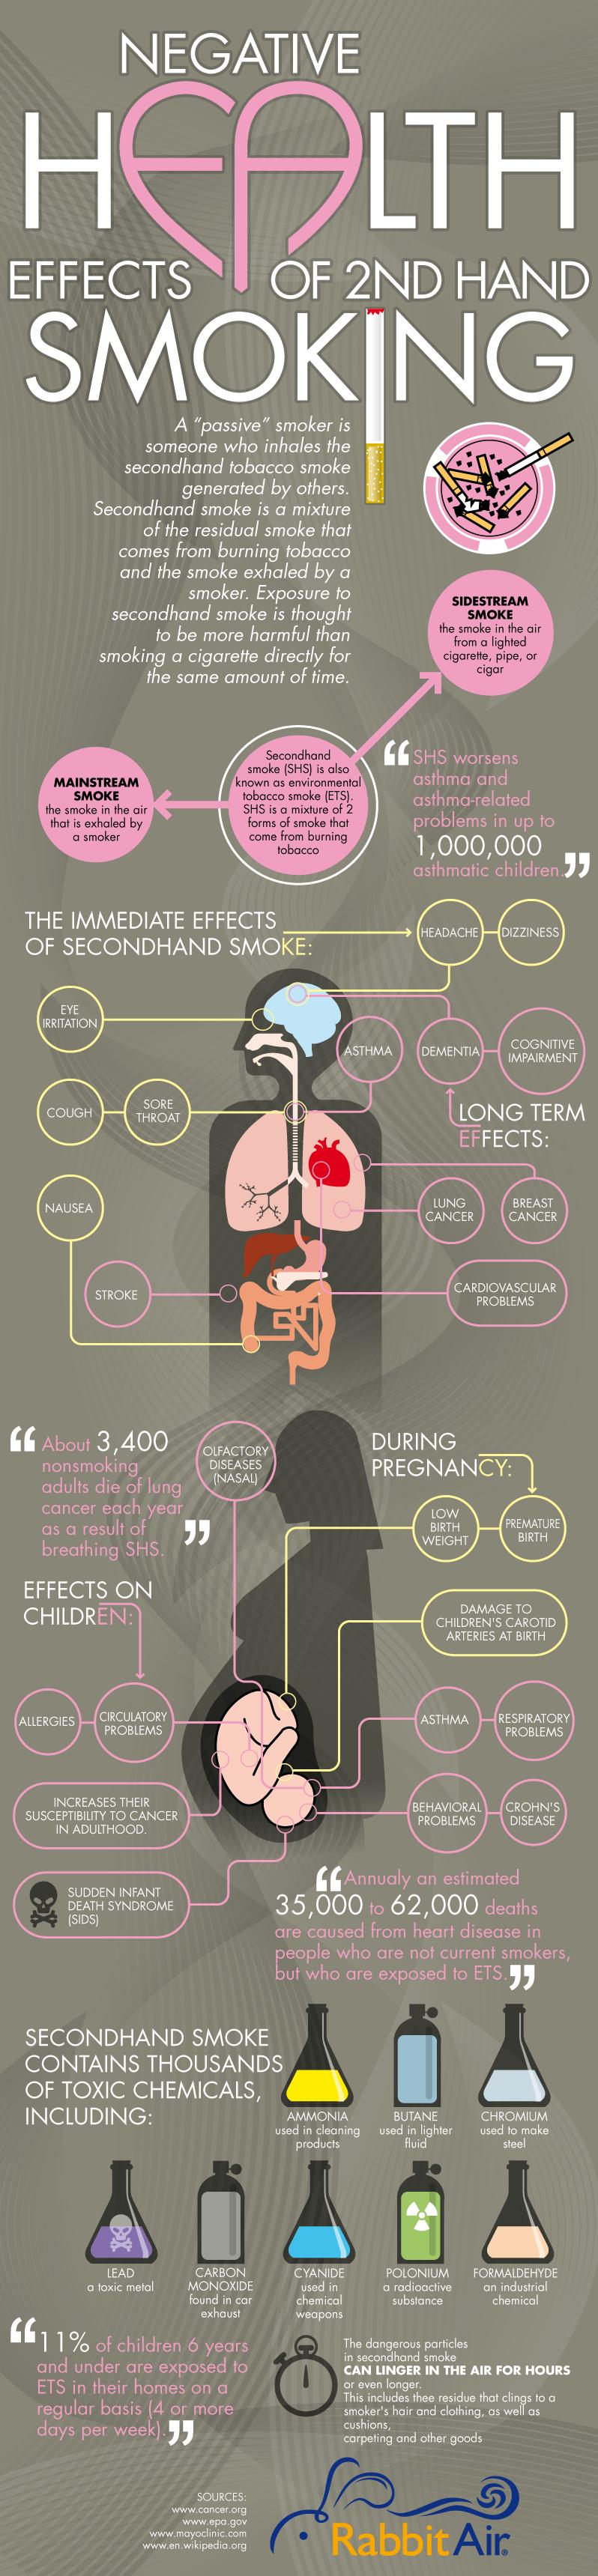 Second Hand Smoke DangersInfographic